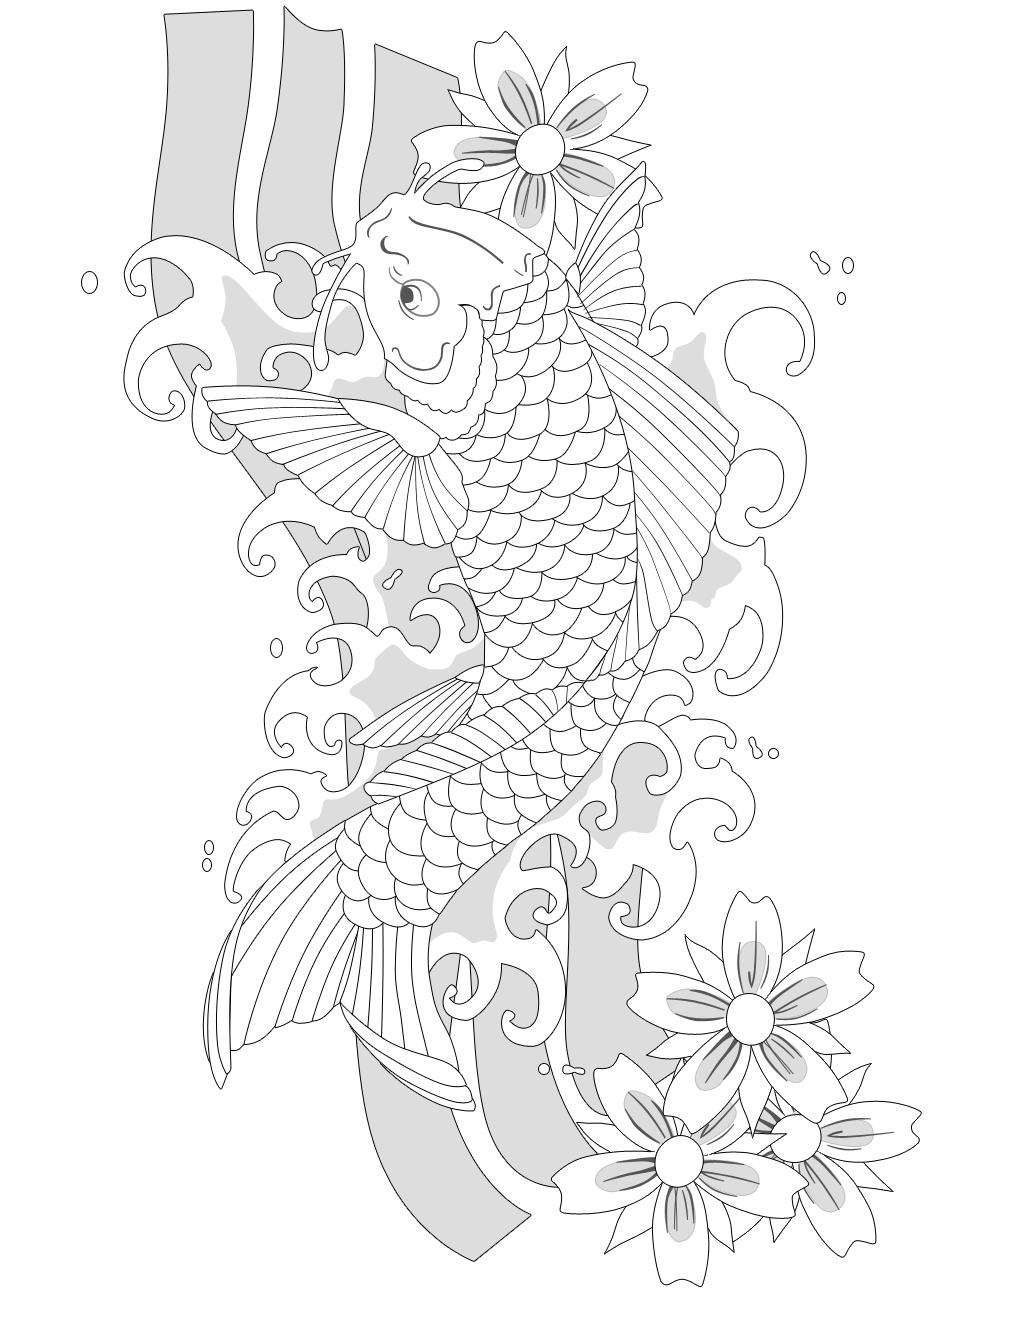 Koi fish by henrique moreira on deviantart for Koi fish outline